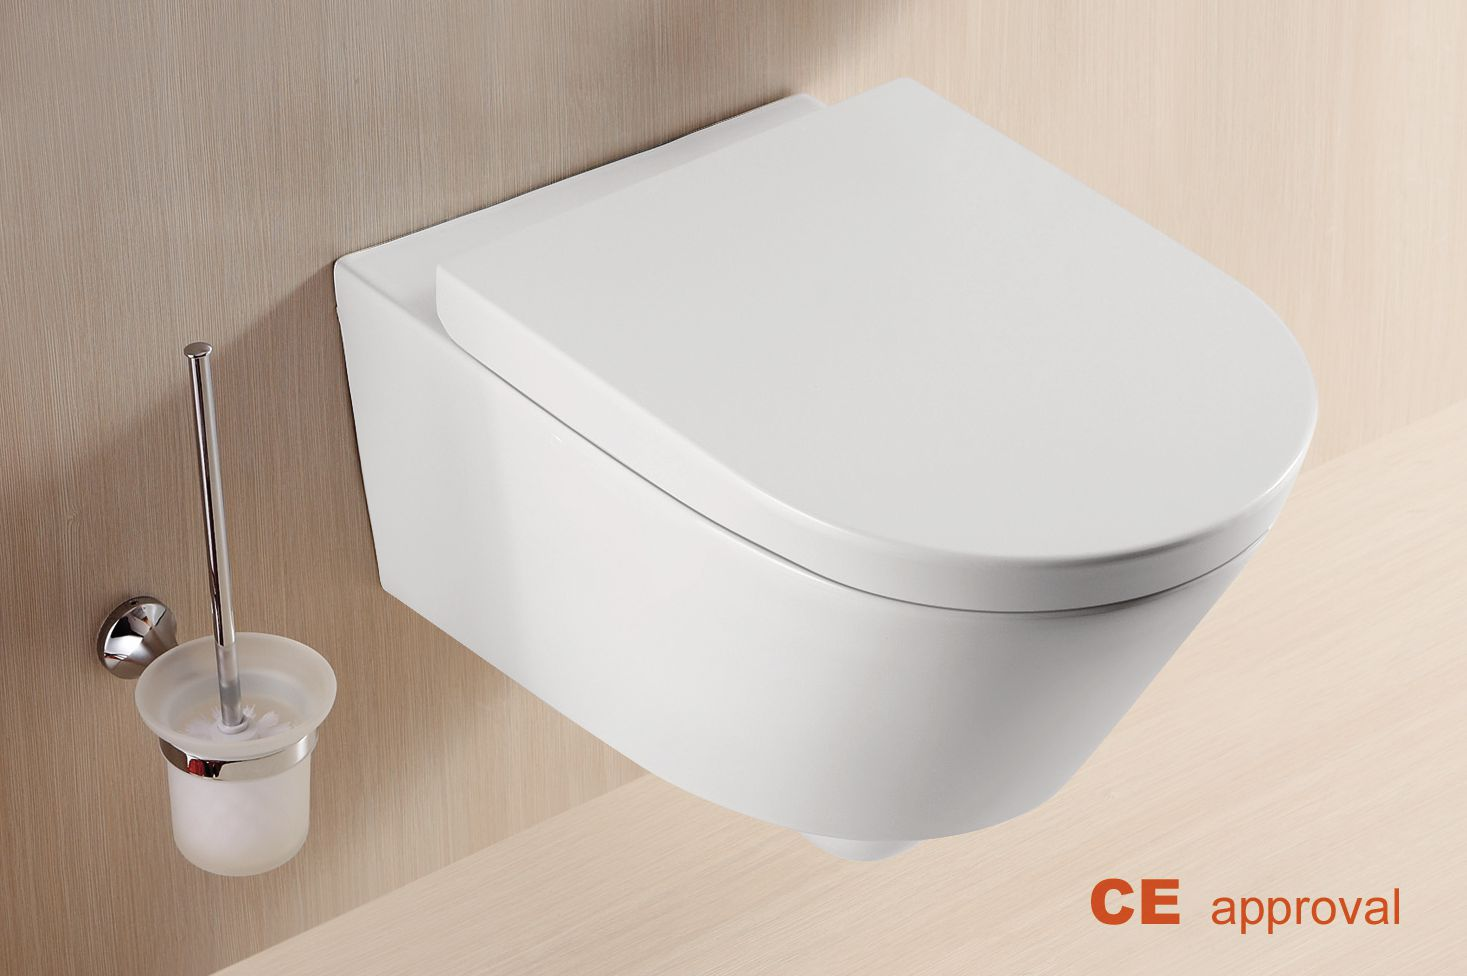 Zwevend Toilet Gamma : ▷ toiletpotten gamma kopen? online internetwinkel